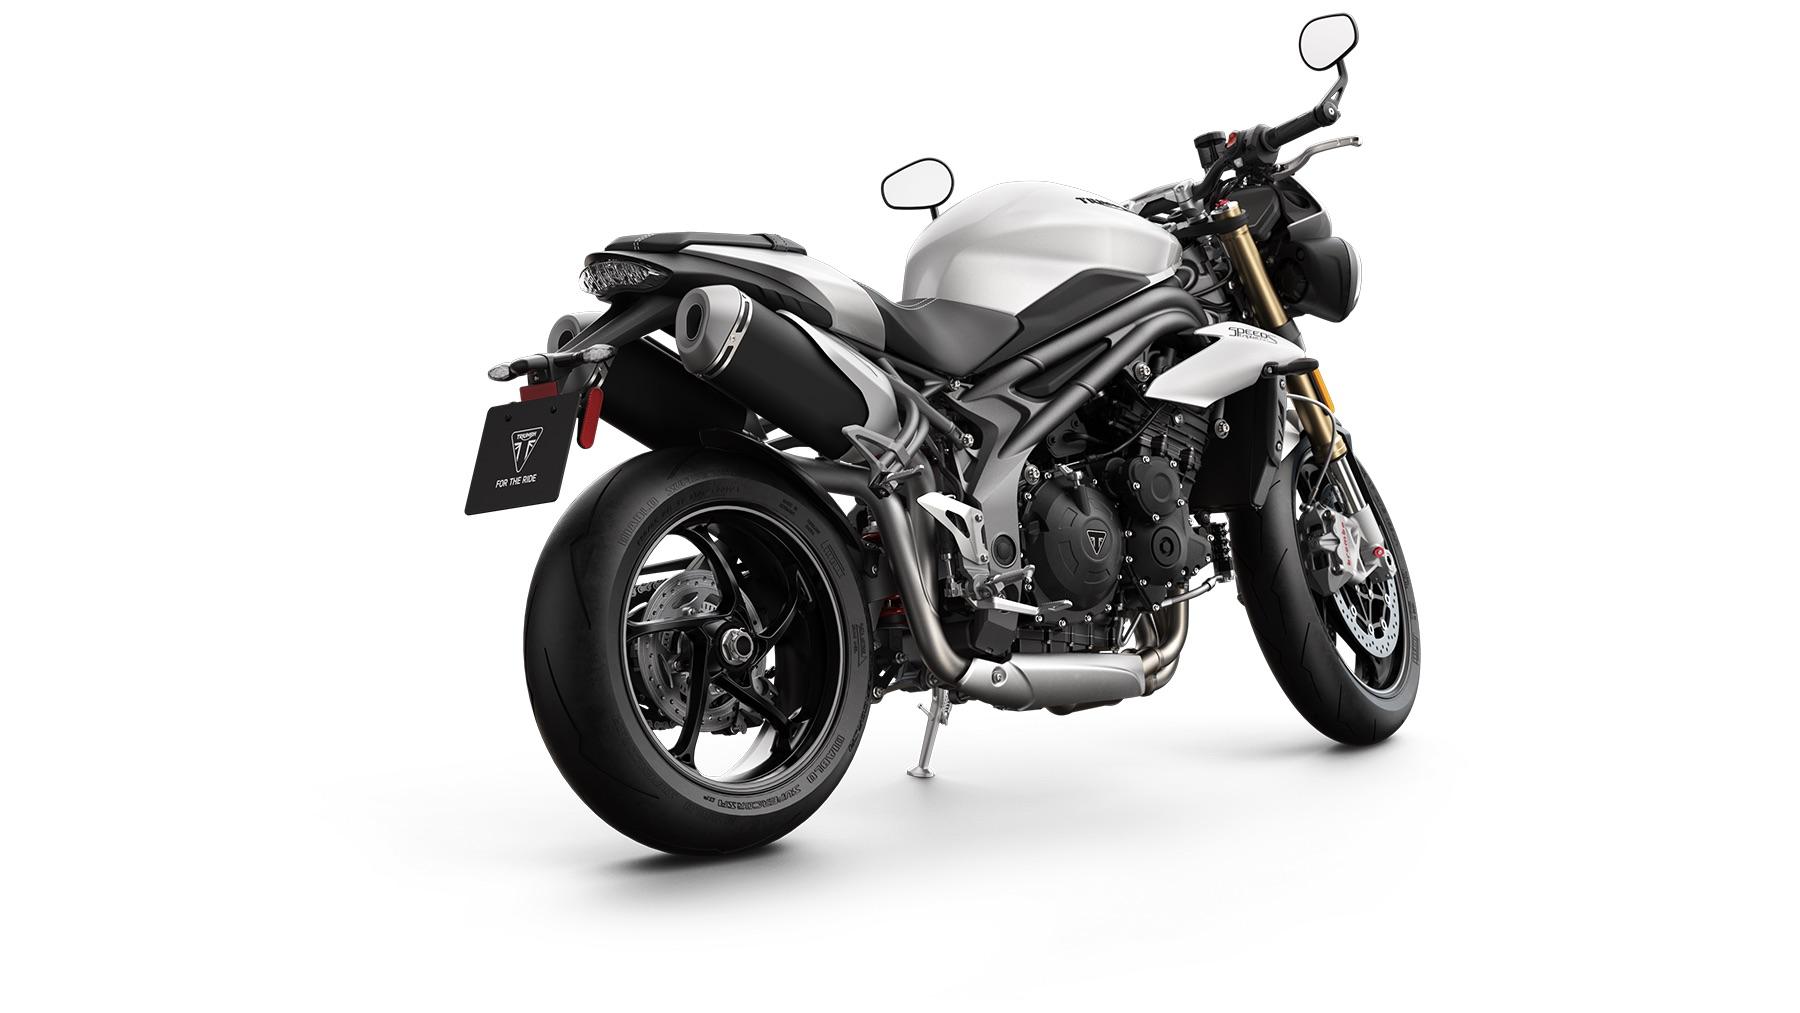 Triumph Speed Triple S / RS 2018